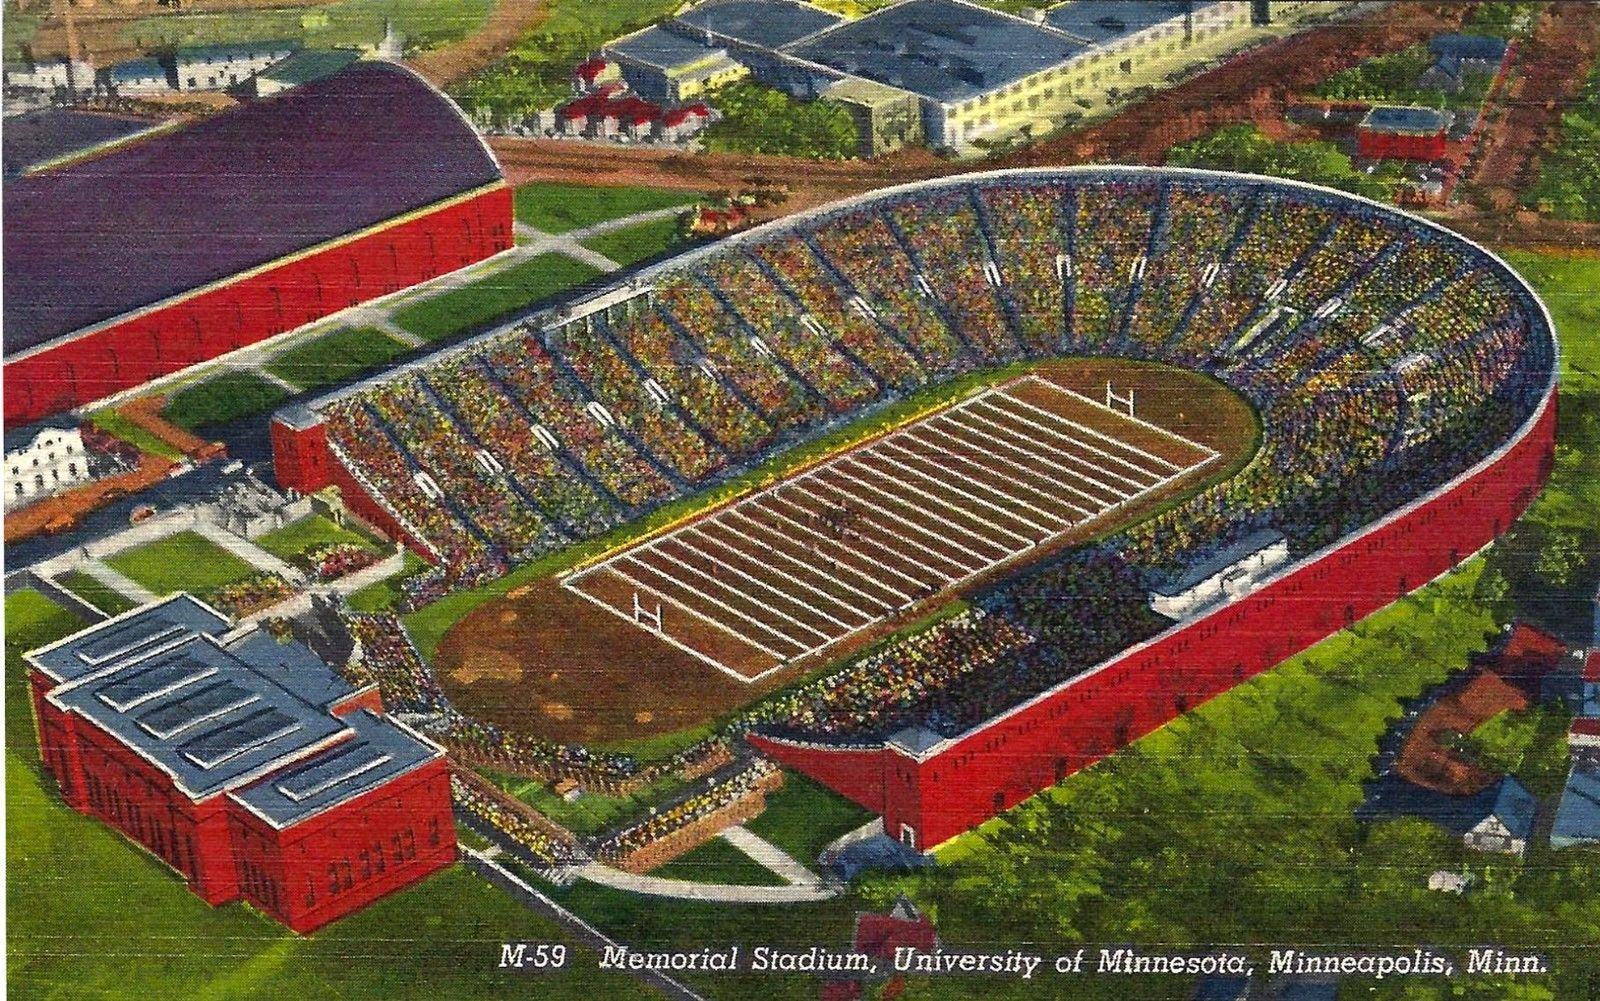 Postcard Of Memorial Stadium In Minnesota University Of